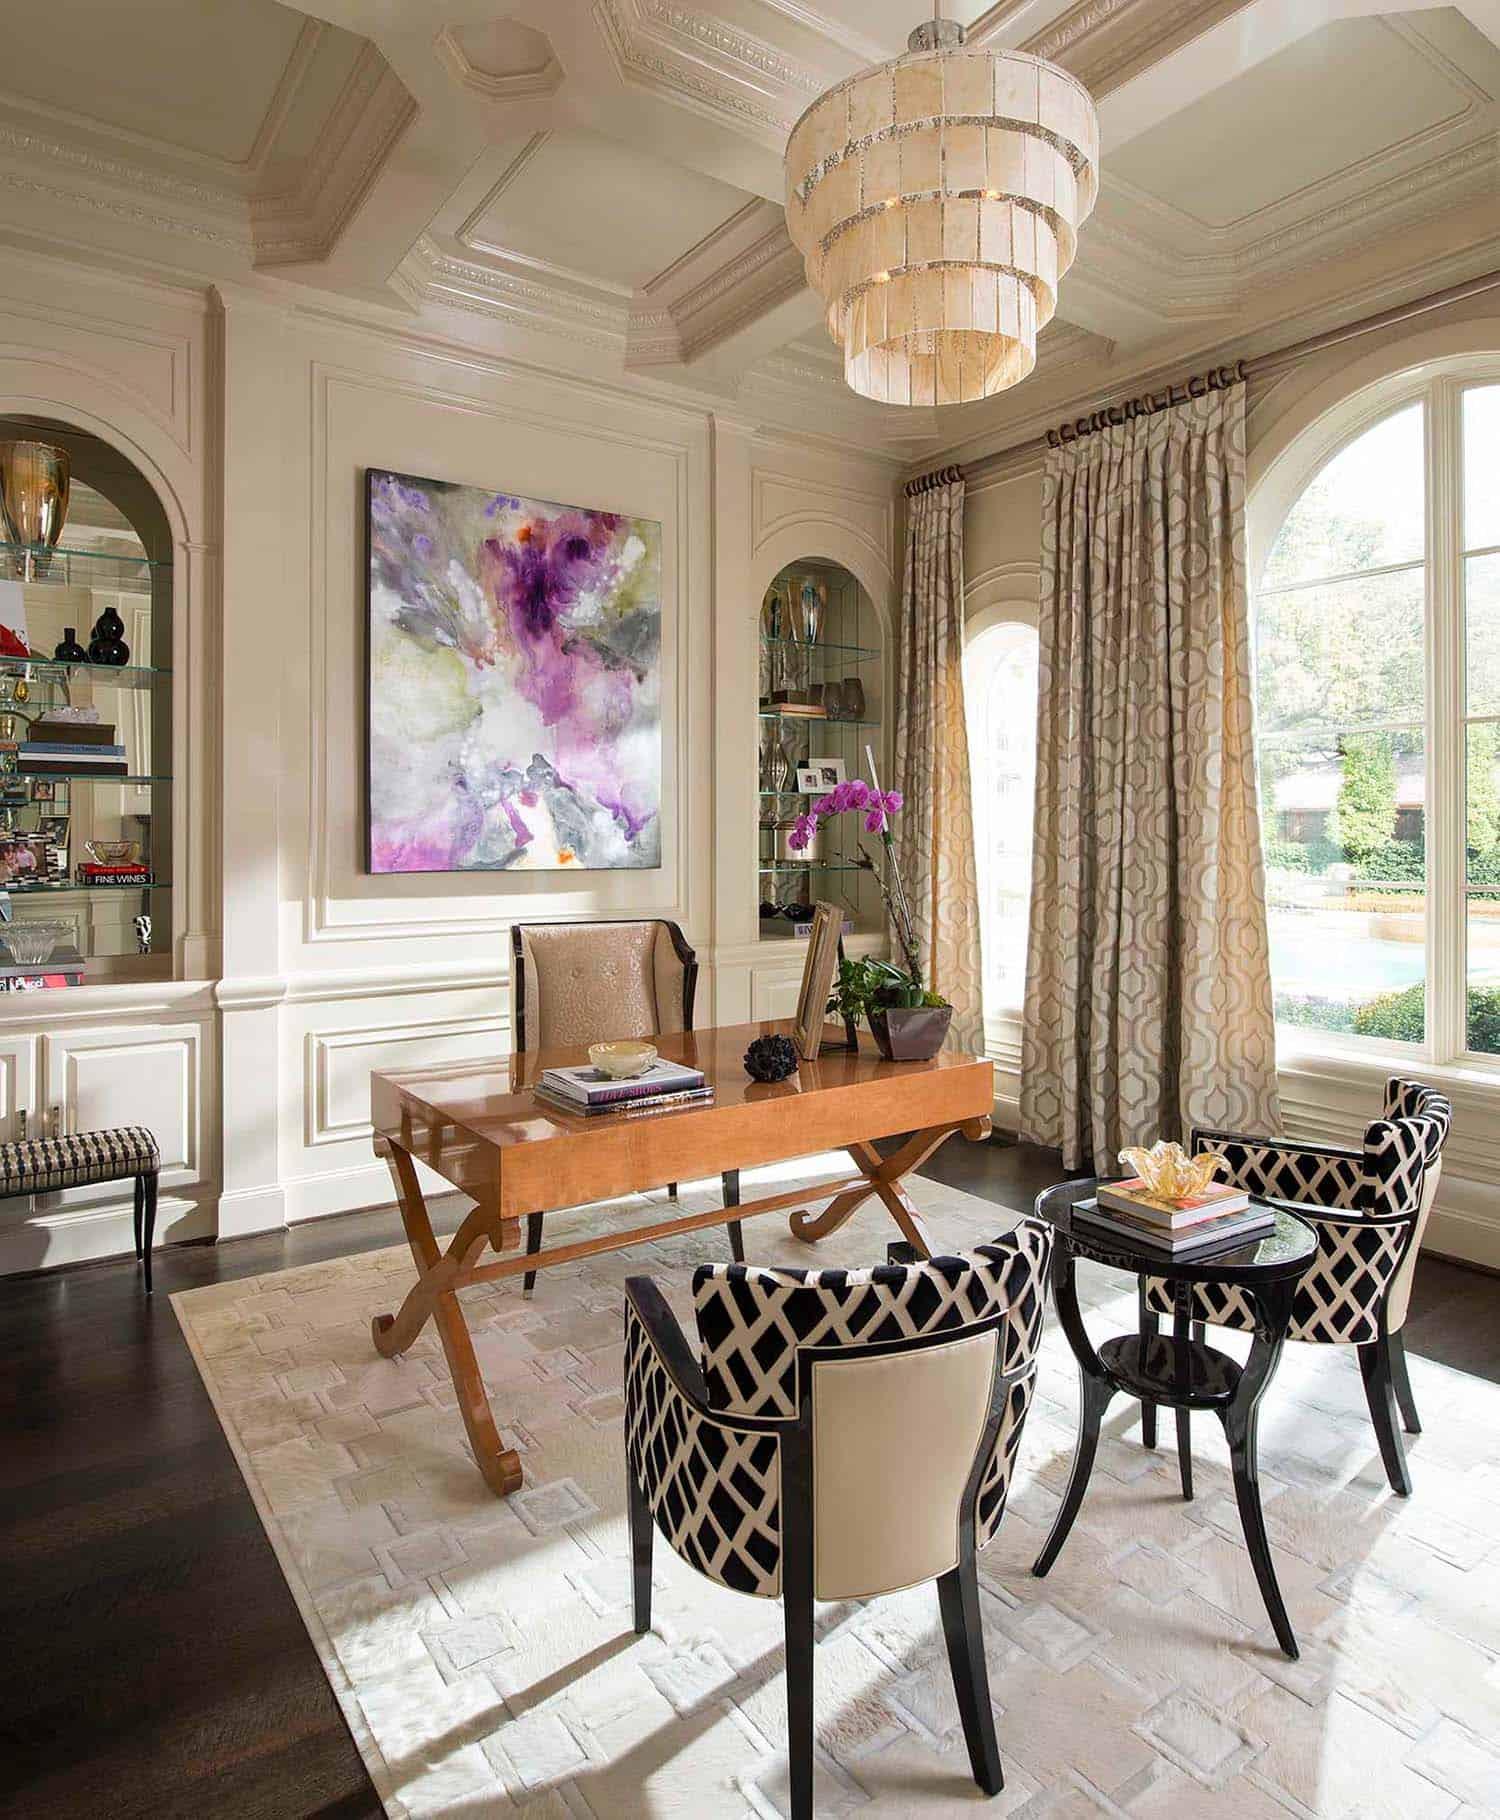 Contemporary Style Home-Dallas Design Group-24-1 Kindesign